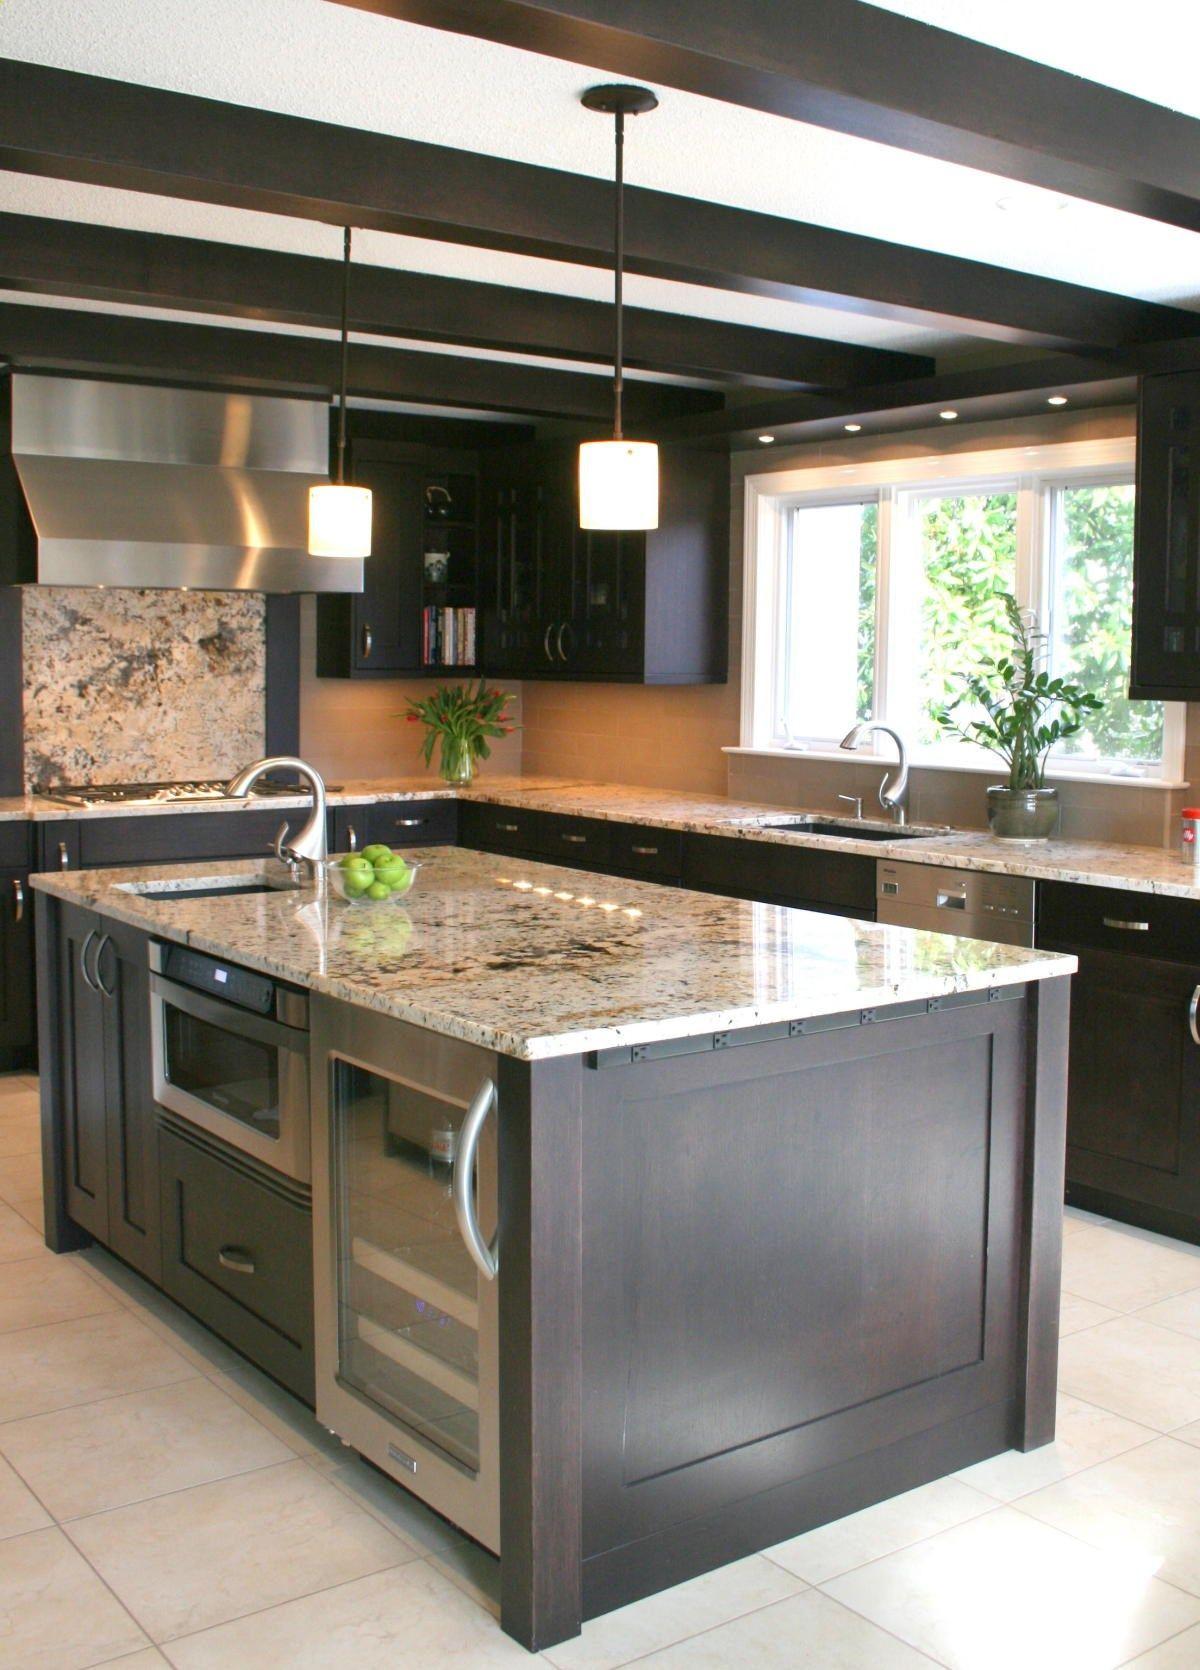 30+ Kitchen island design ideas for small spaces ideas